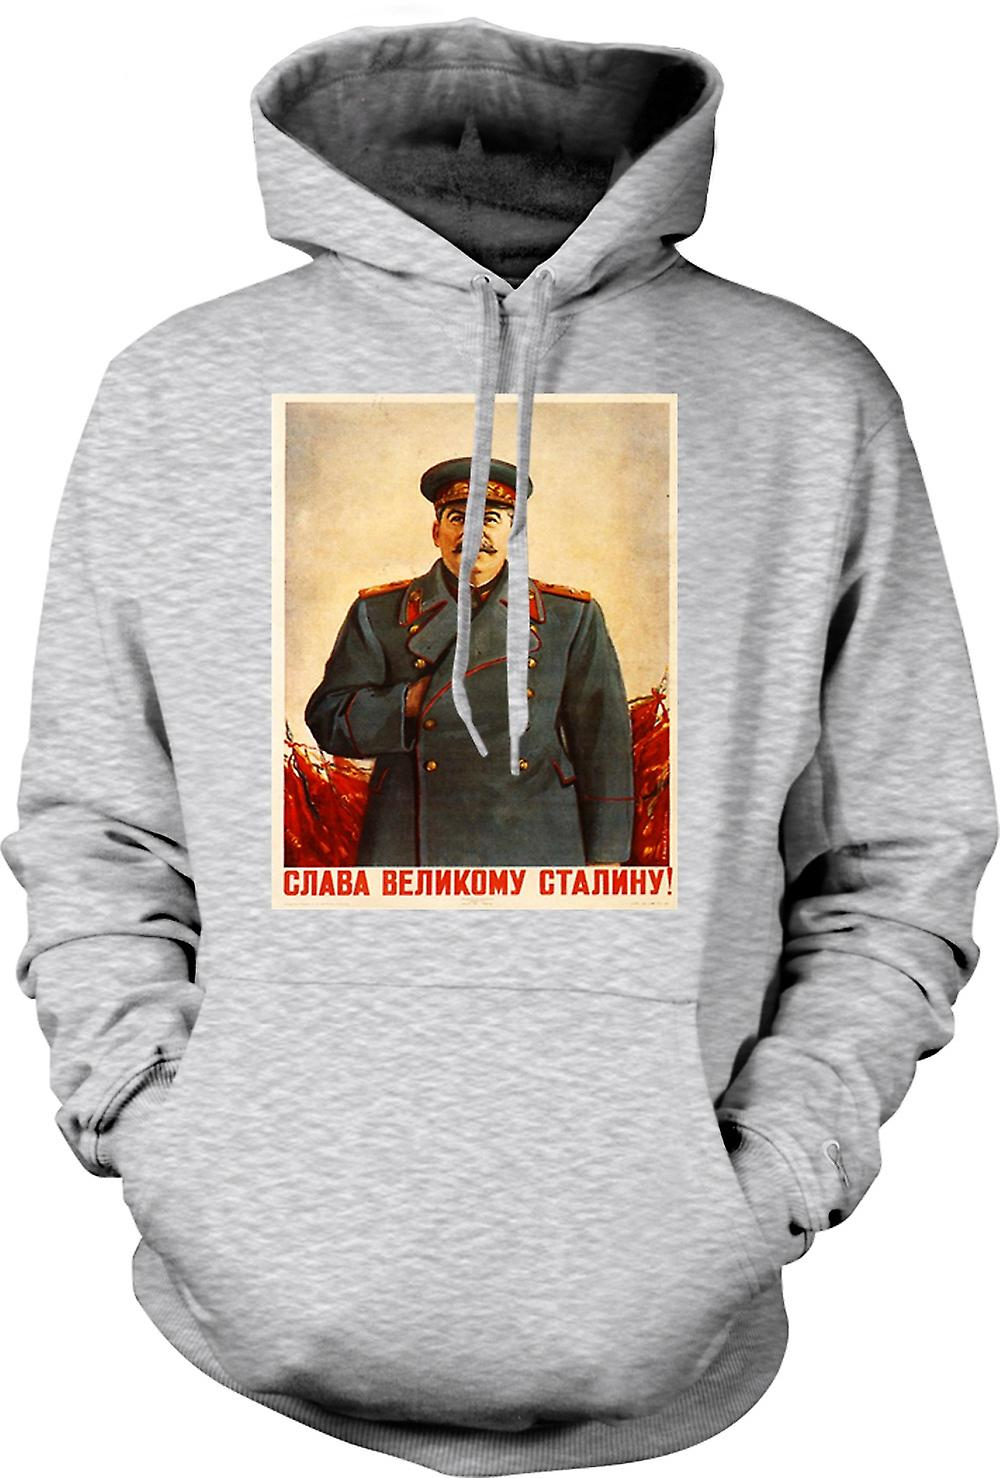 Mens-Hoodie - russische Propaganda-Poster - Stalin